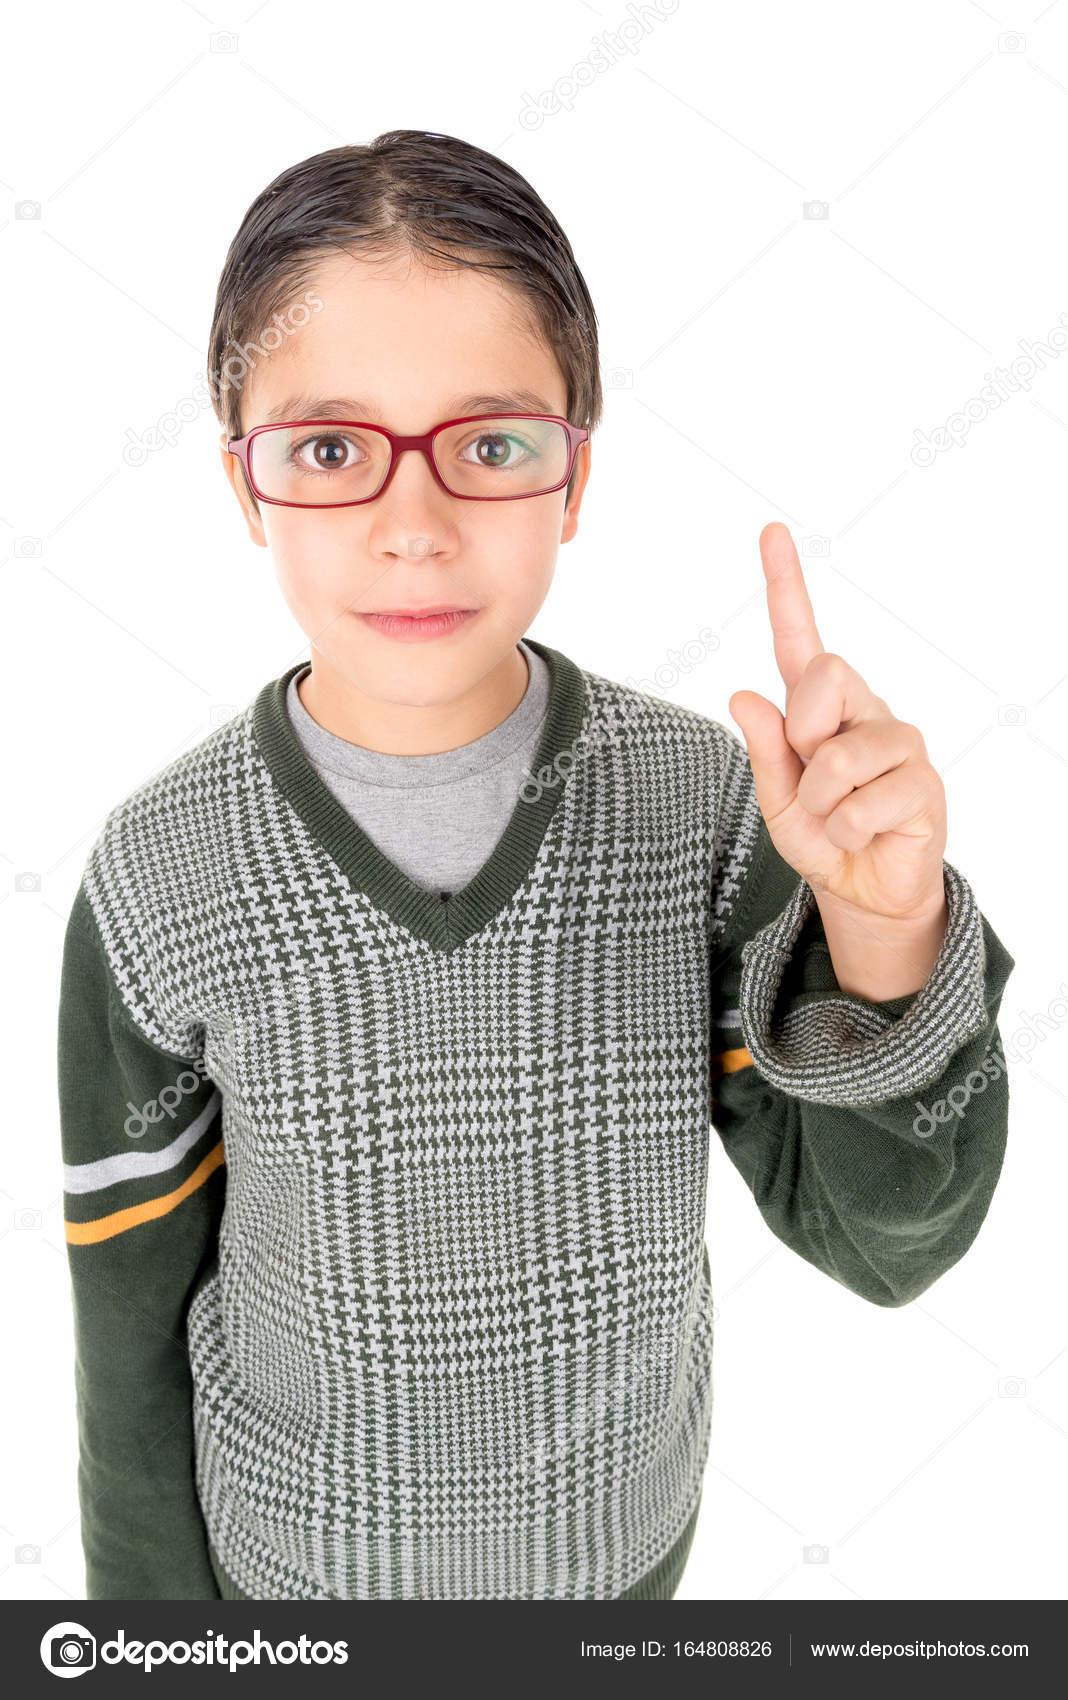 26e5fd0720 Ευτυχισμένος nerd θέτοντας απομονωθεί σε λευκό φόντο — Εικόνα από luislouro